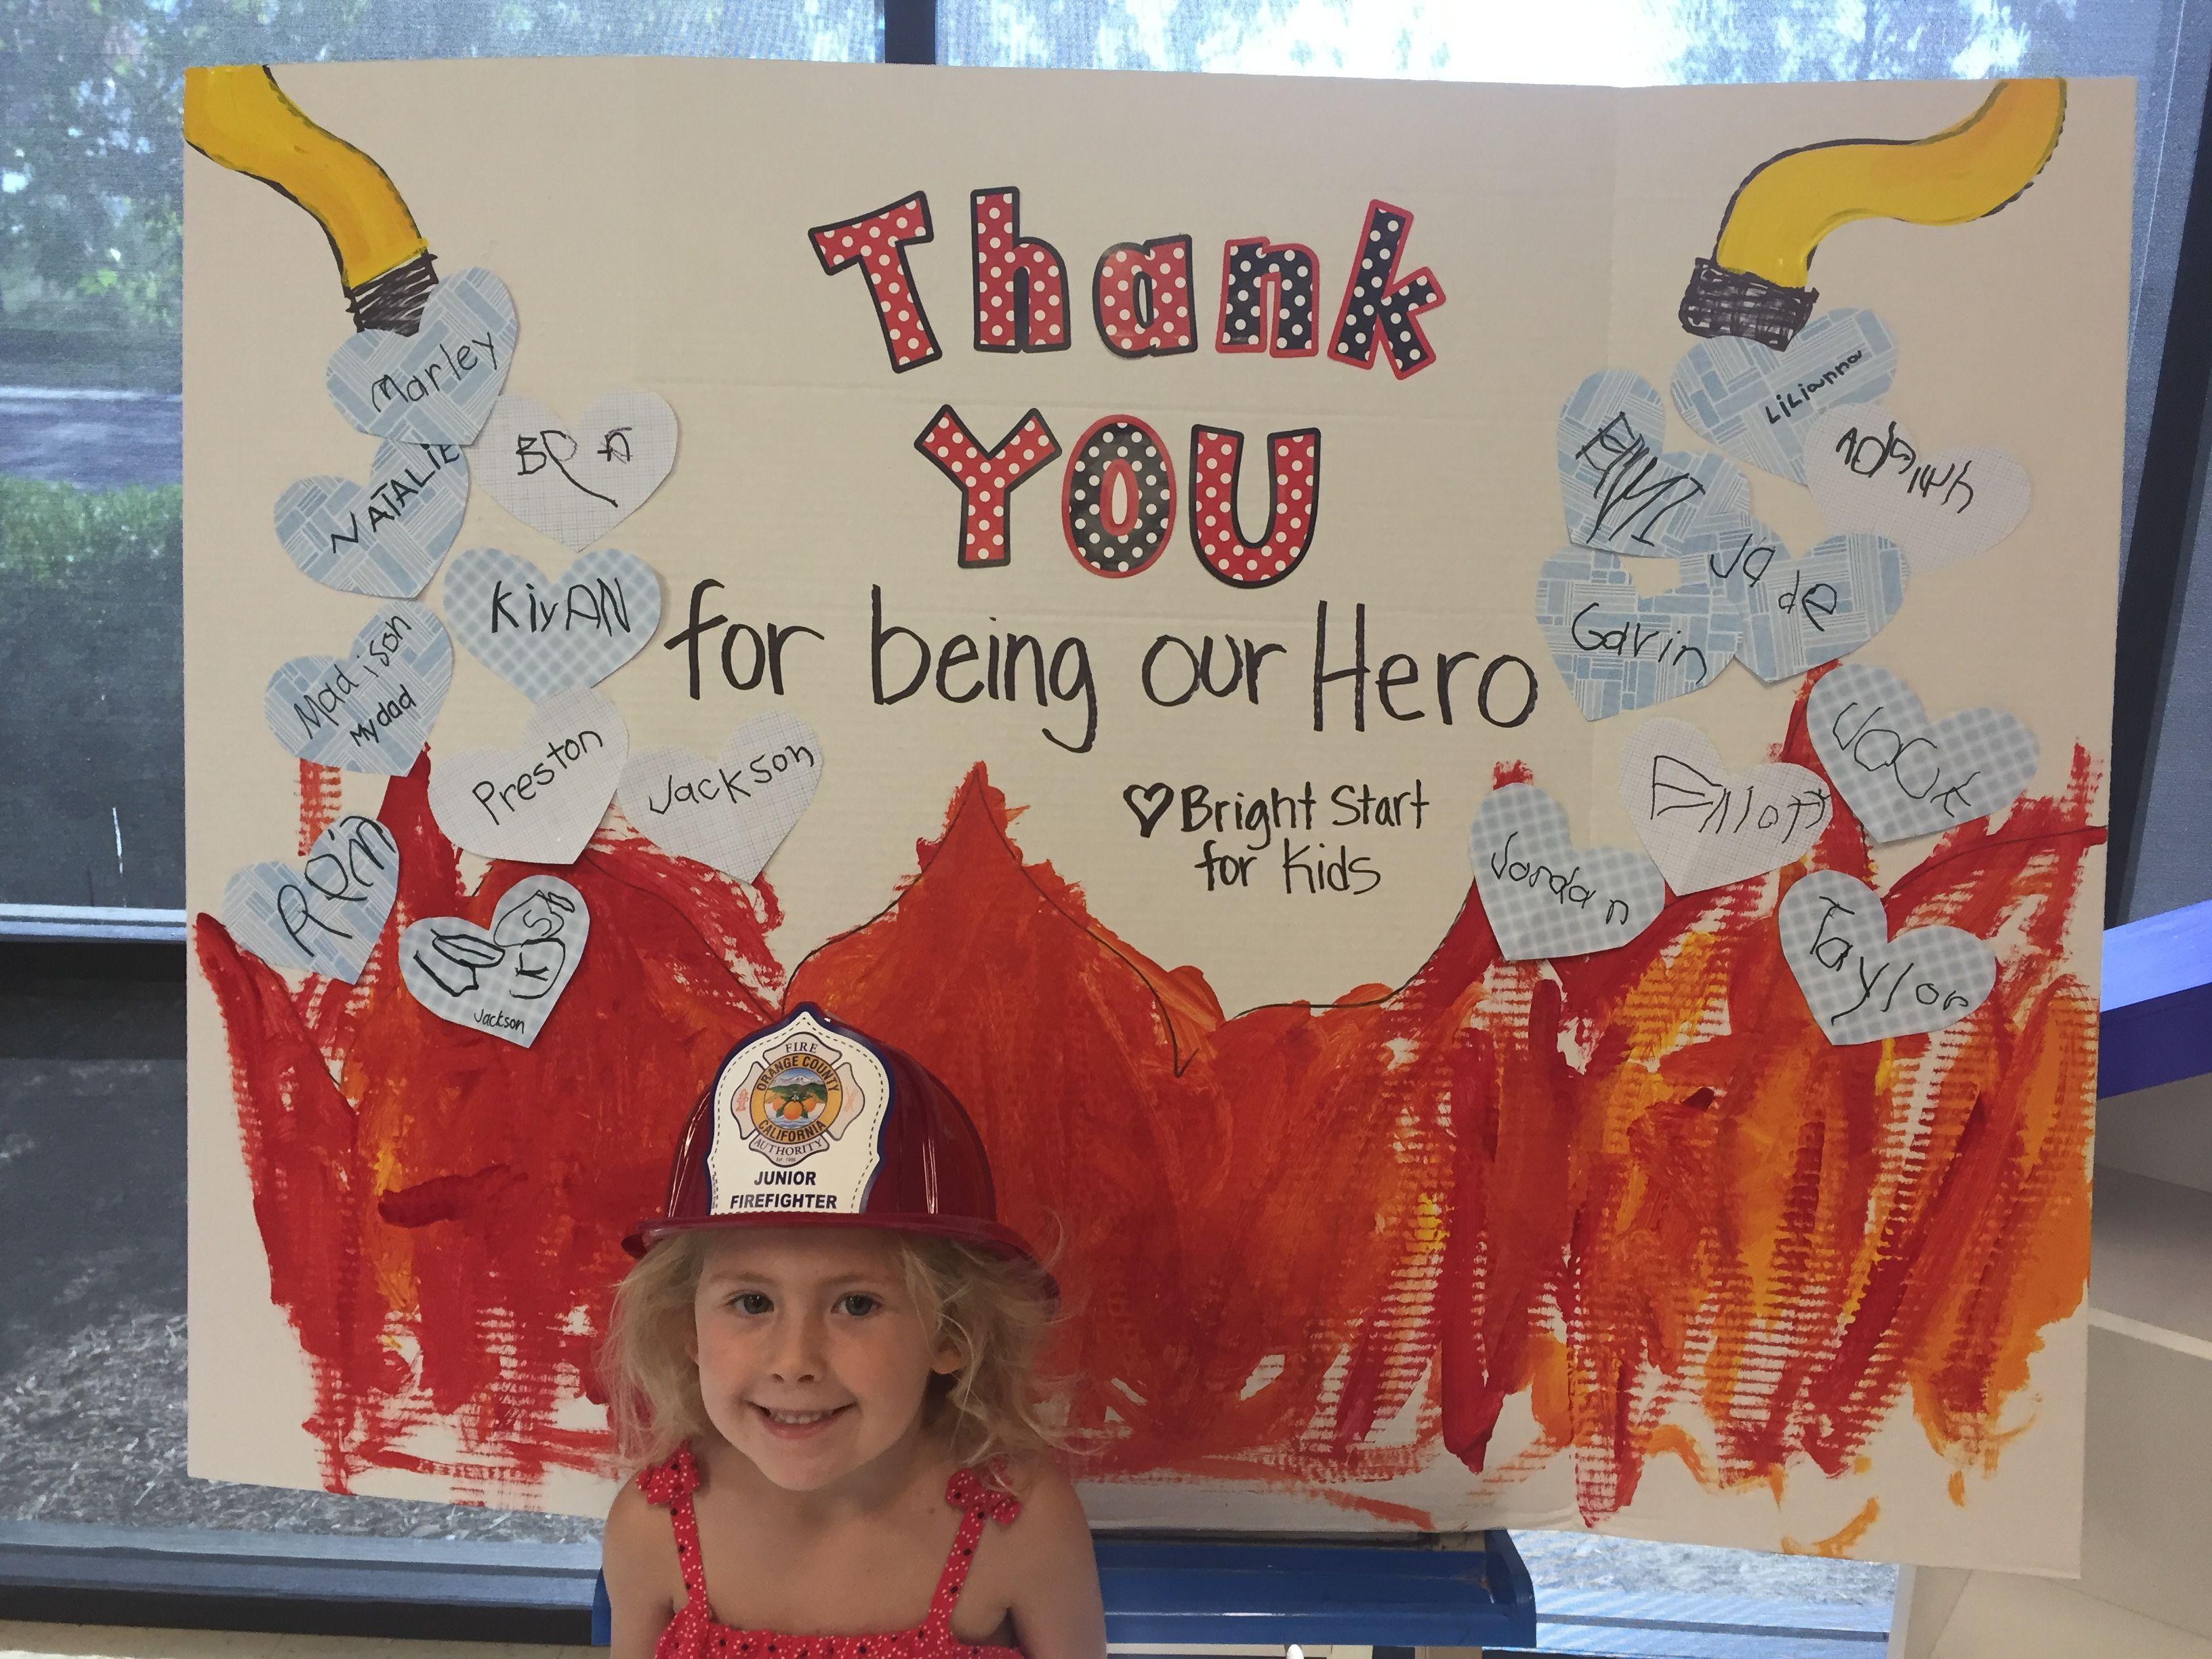 Card Firefighter Visit Bright Start Kids Fire Safety Week Community